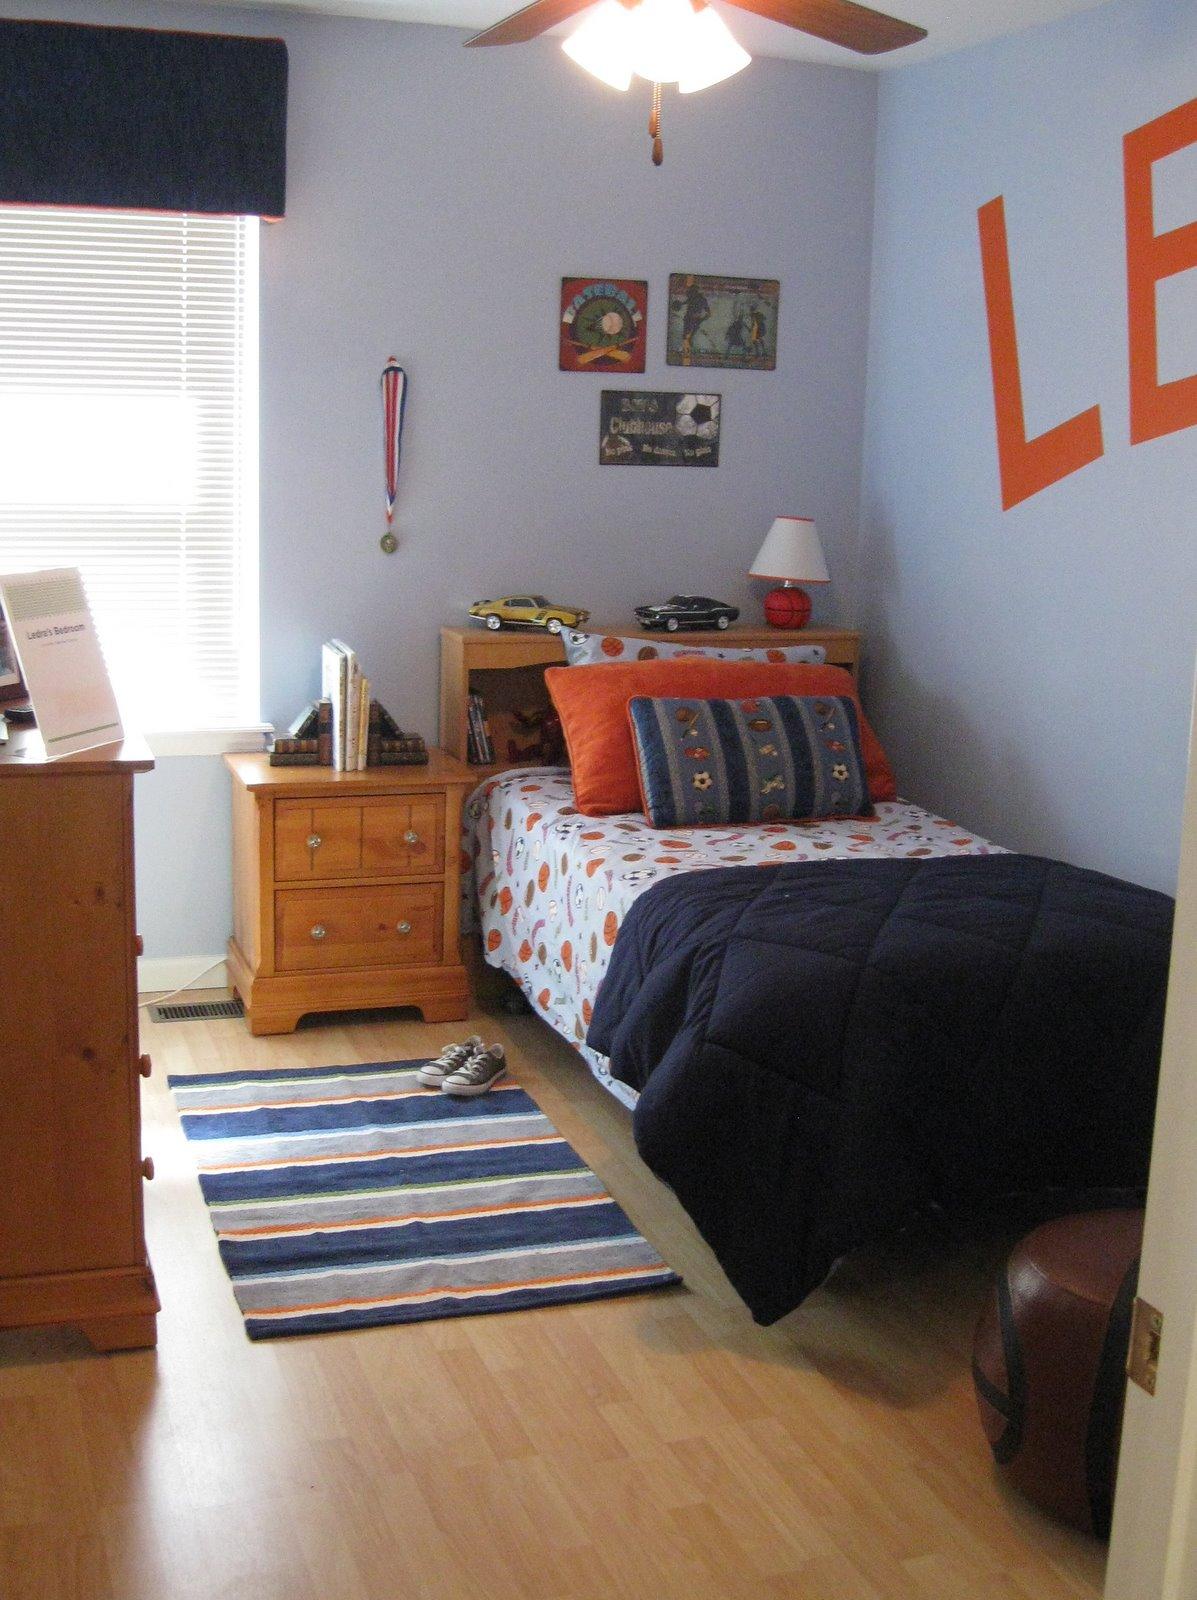 The Interior Design Ideas: Ideas For Little Boys Bedroom ... on Small Bedroom Ideas For Boys  id=17249